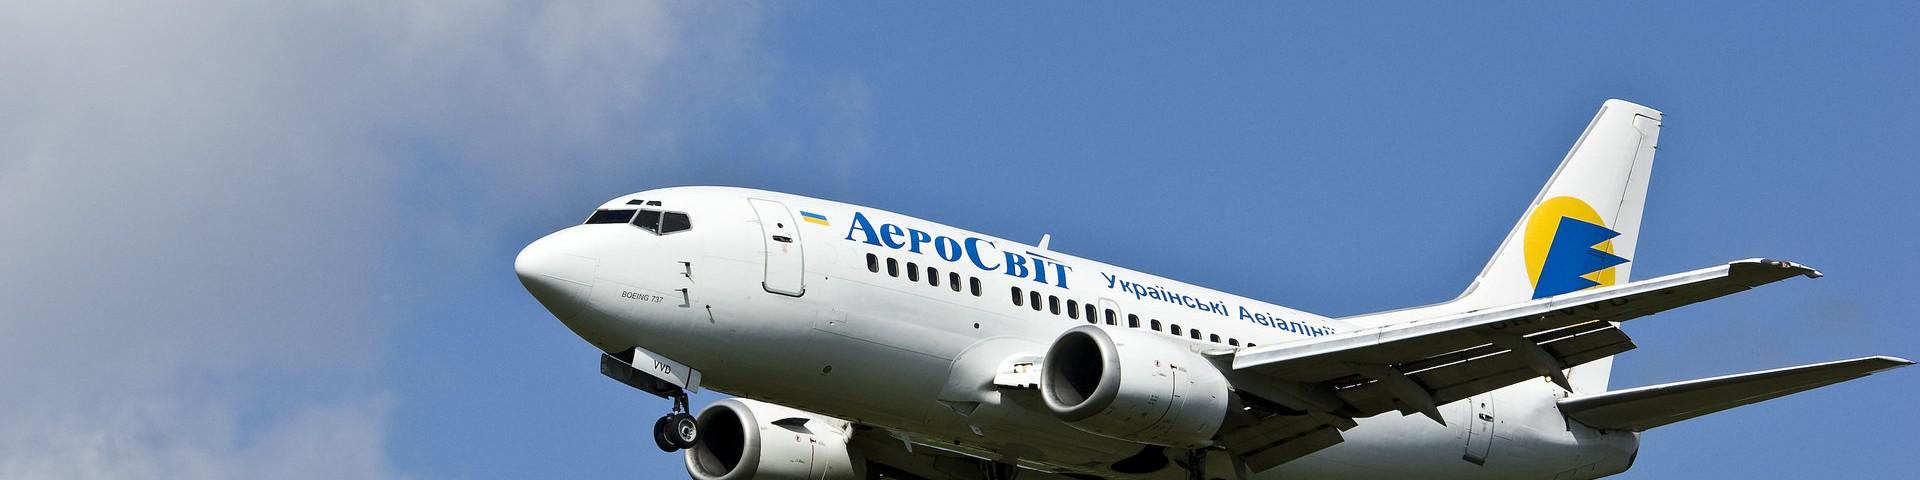 Boeing 737 Aerosvit Airlines